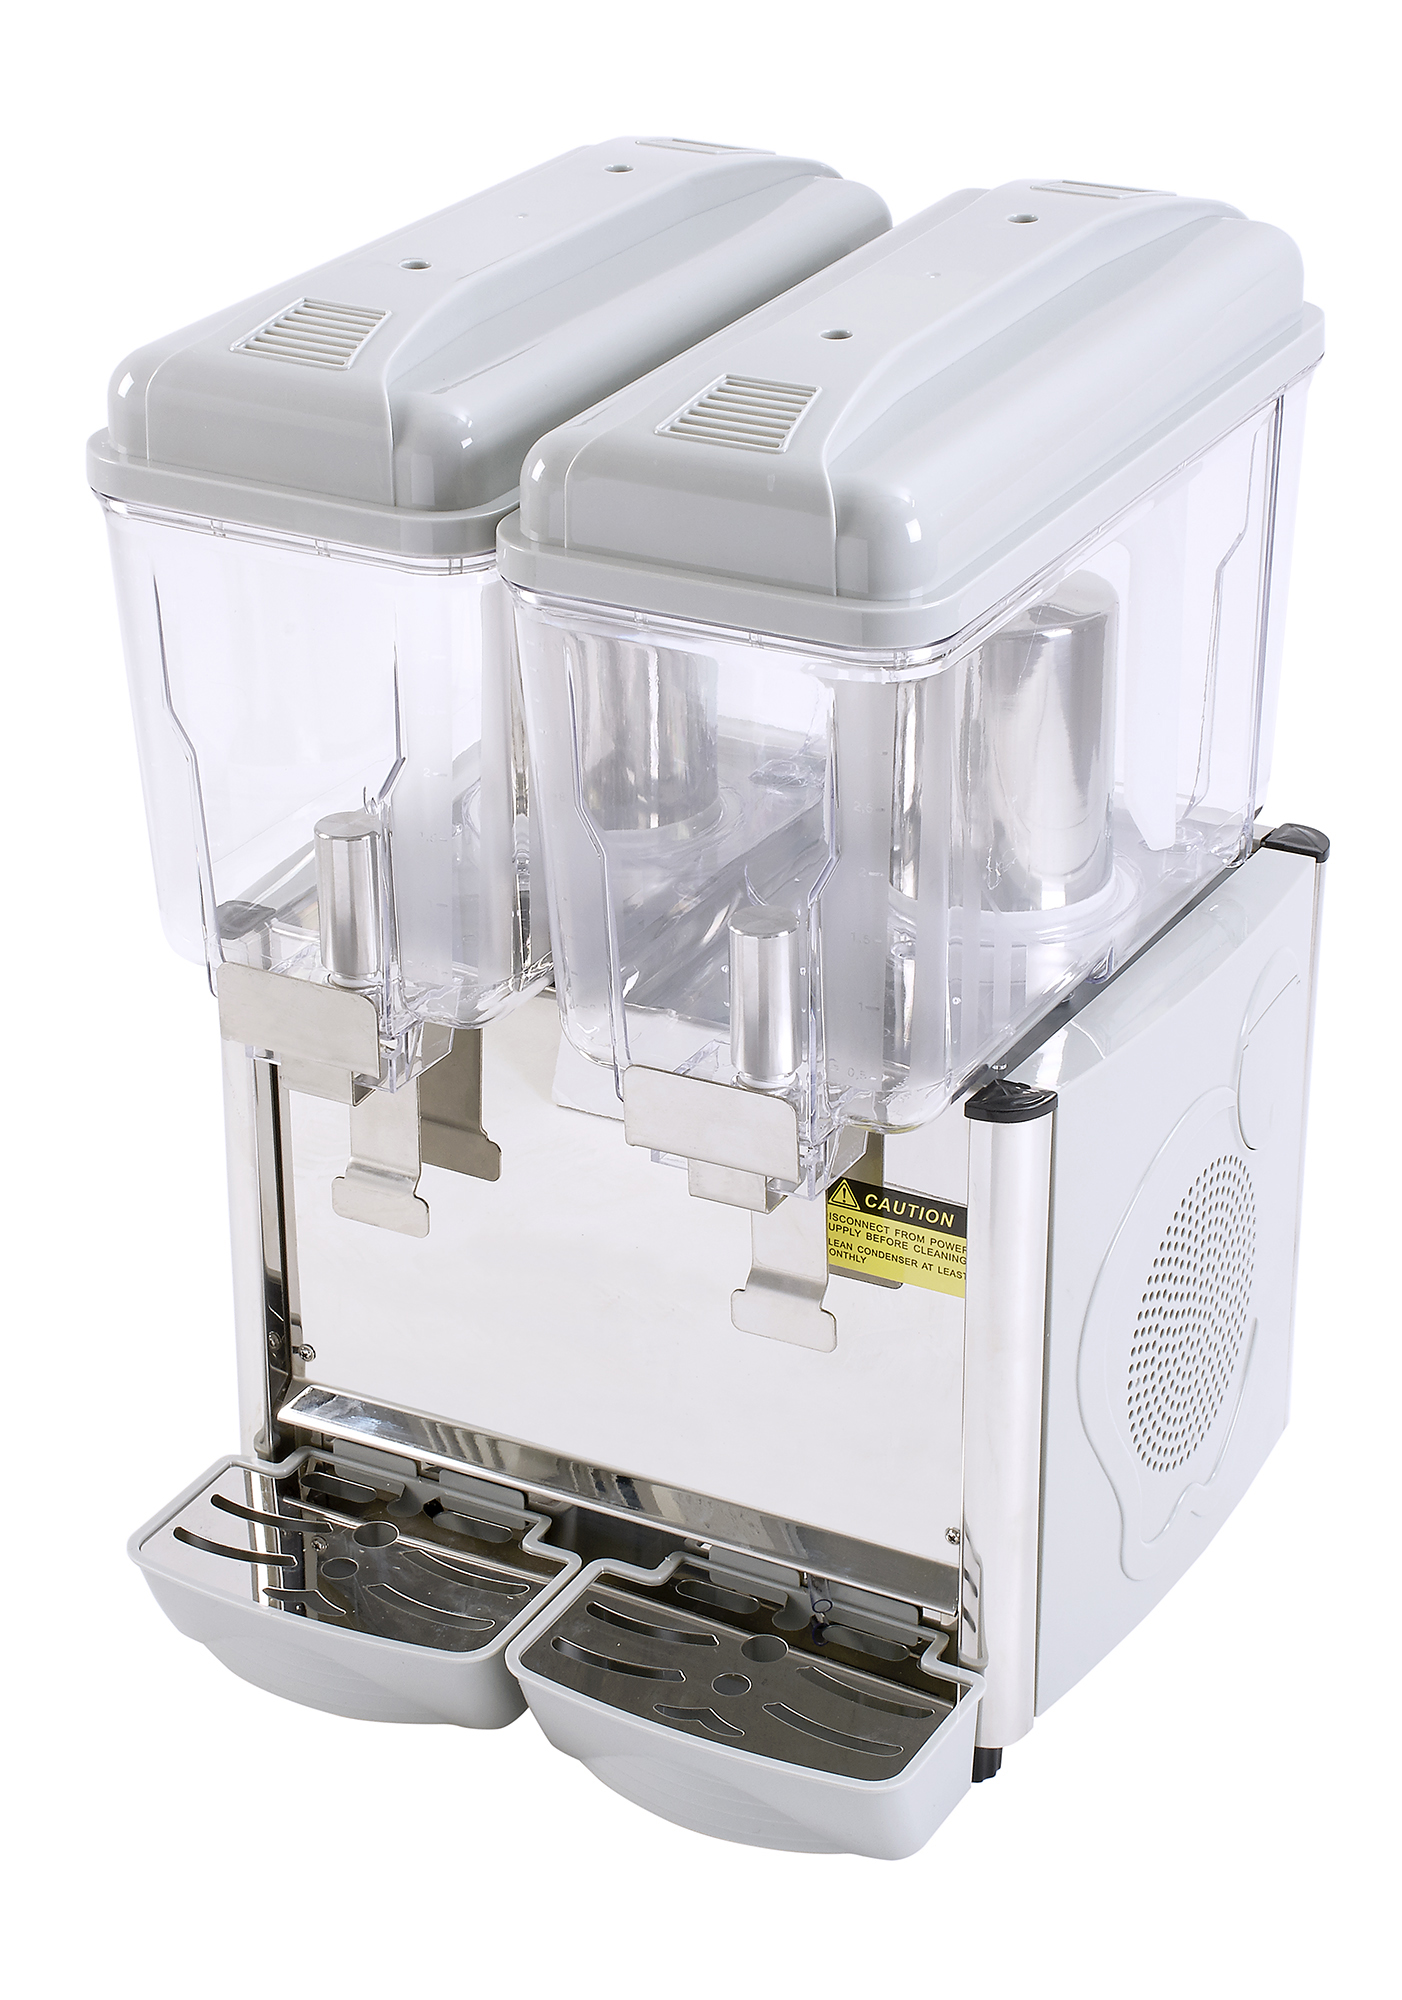 Admiral Craft JD-2 juice dispenser